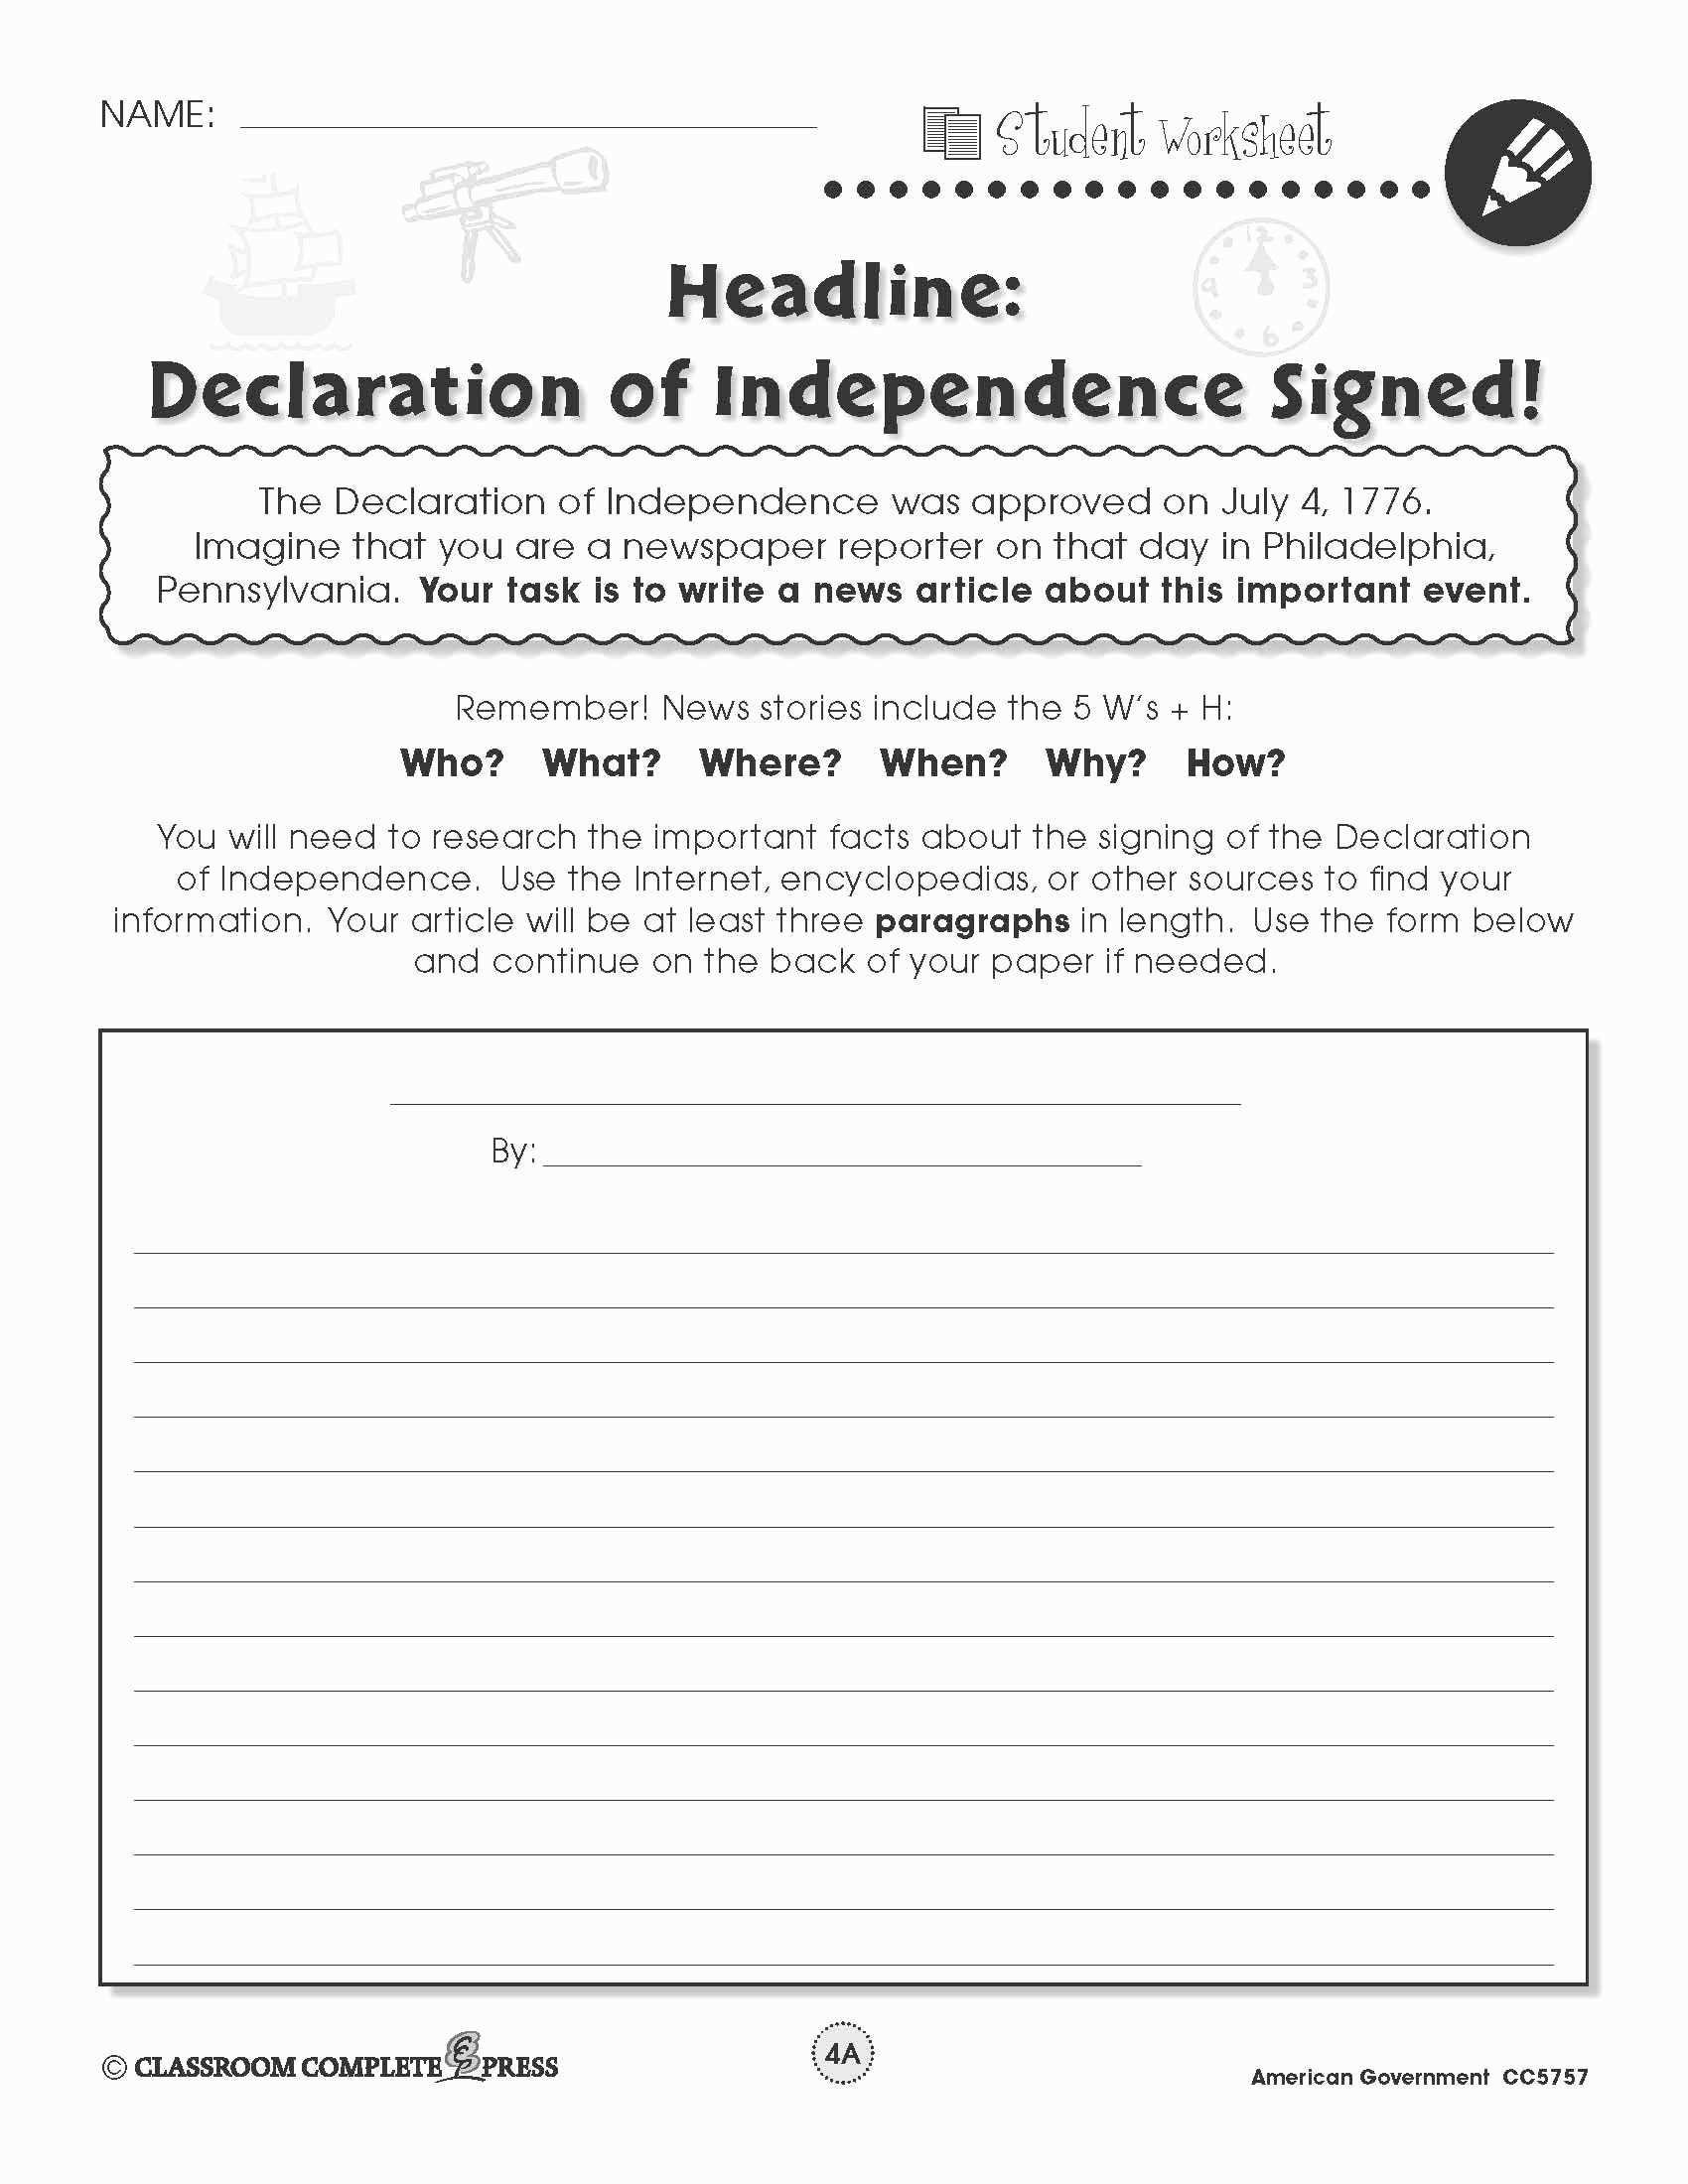 hight resolution of Mark Twain Worksheet Answers   Social studies worksheets